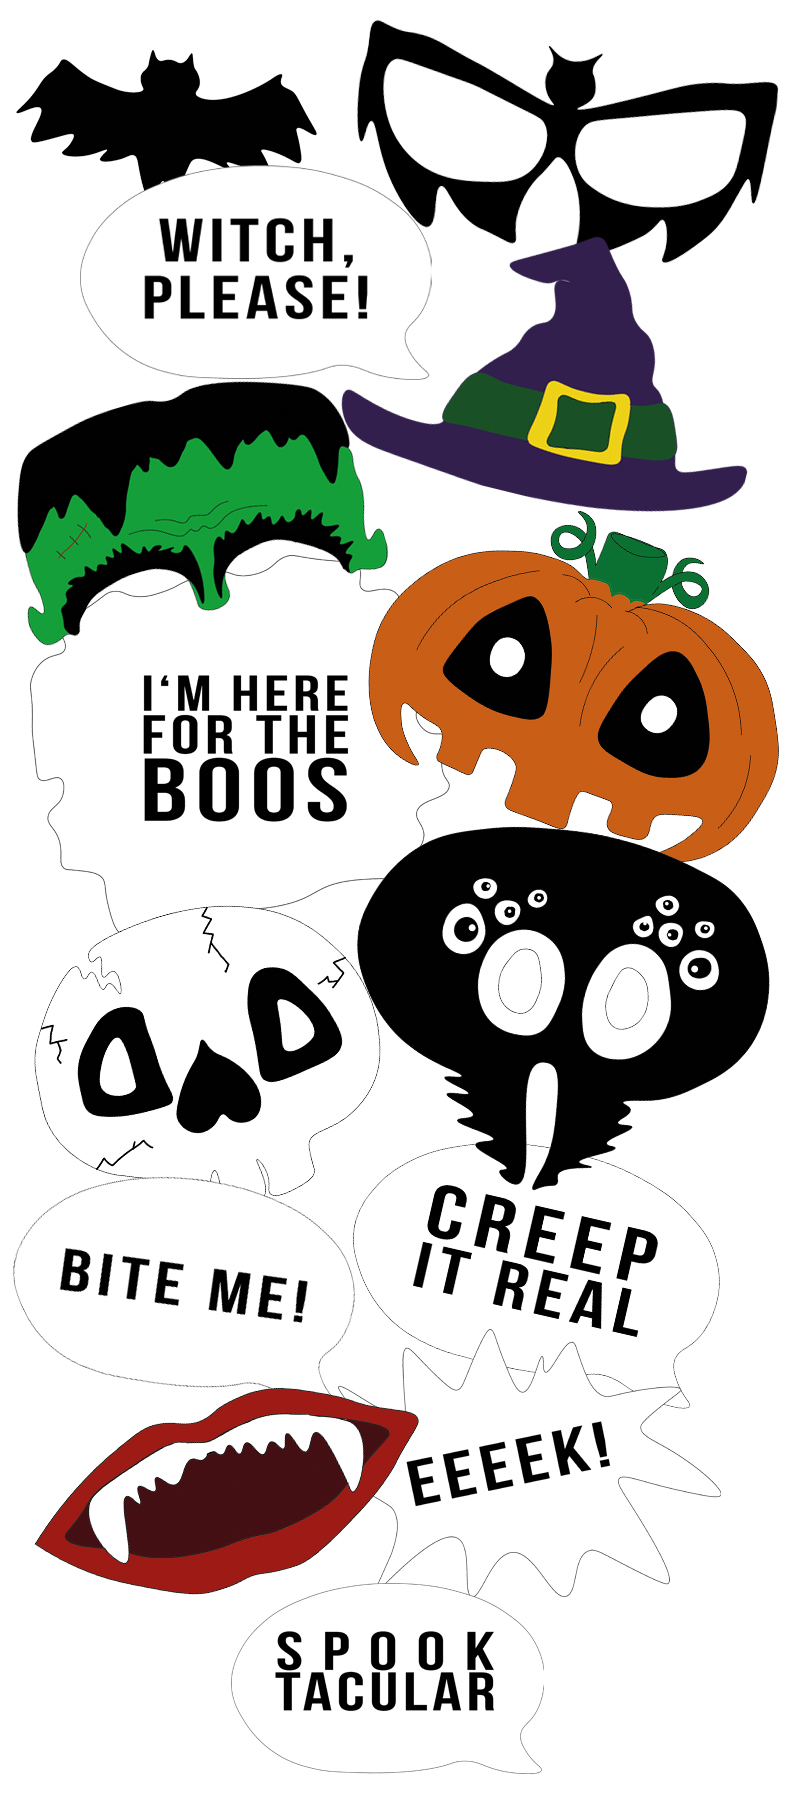 Fotobooth-Halloween-Mohntage-Mockups-Pinterest